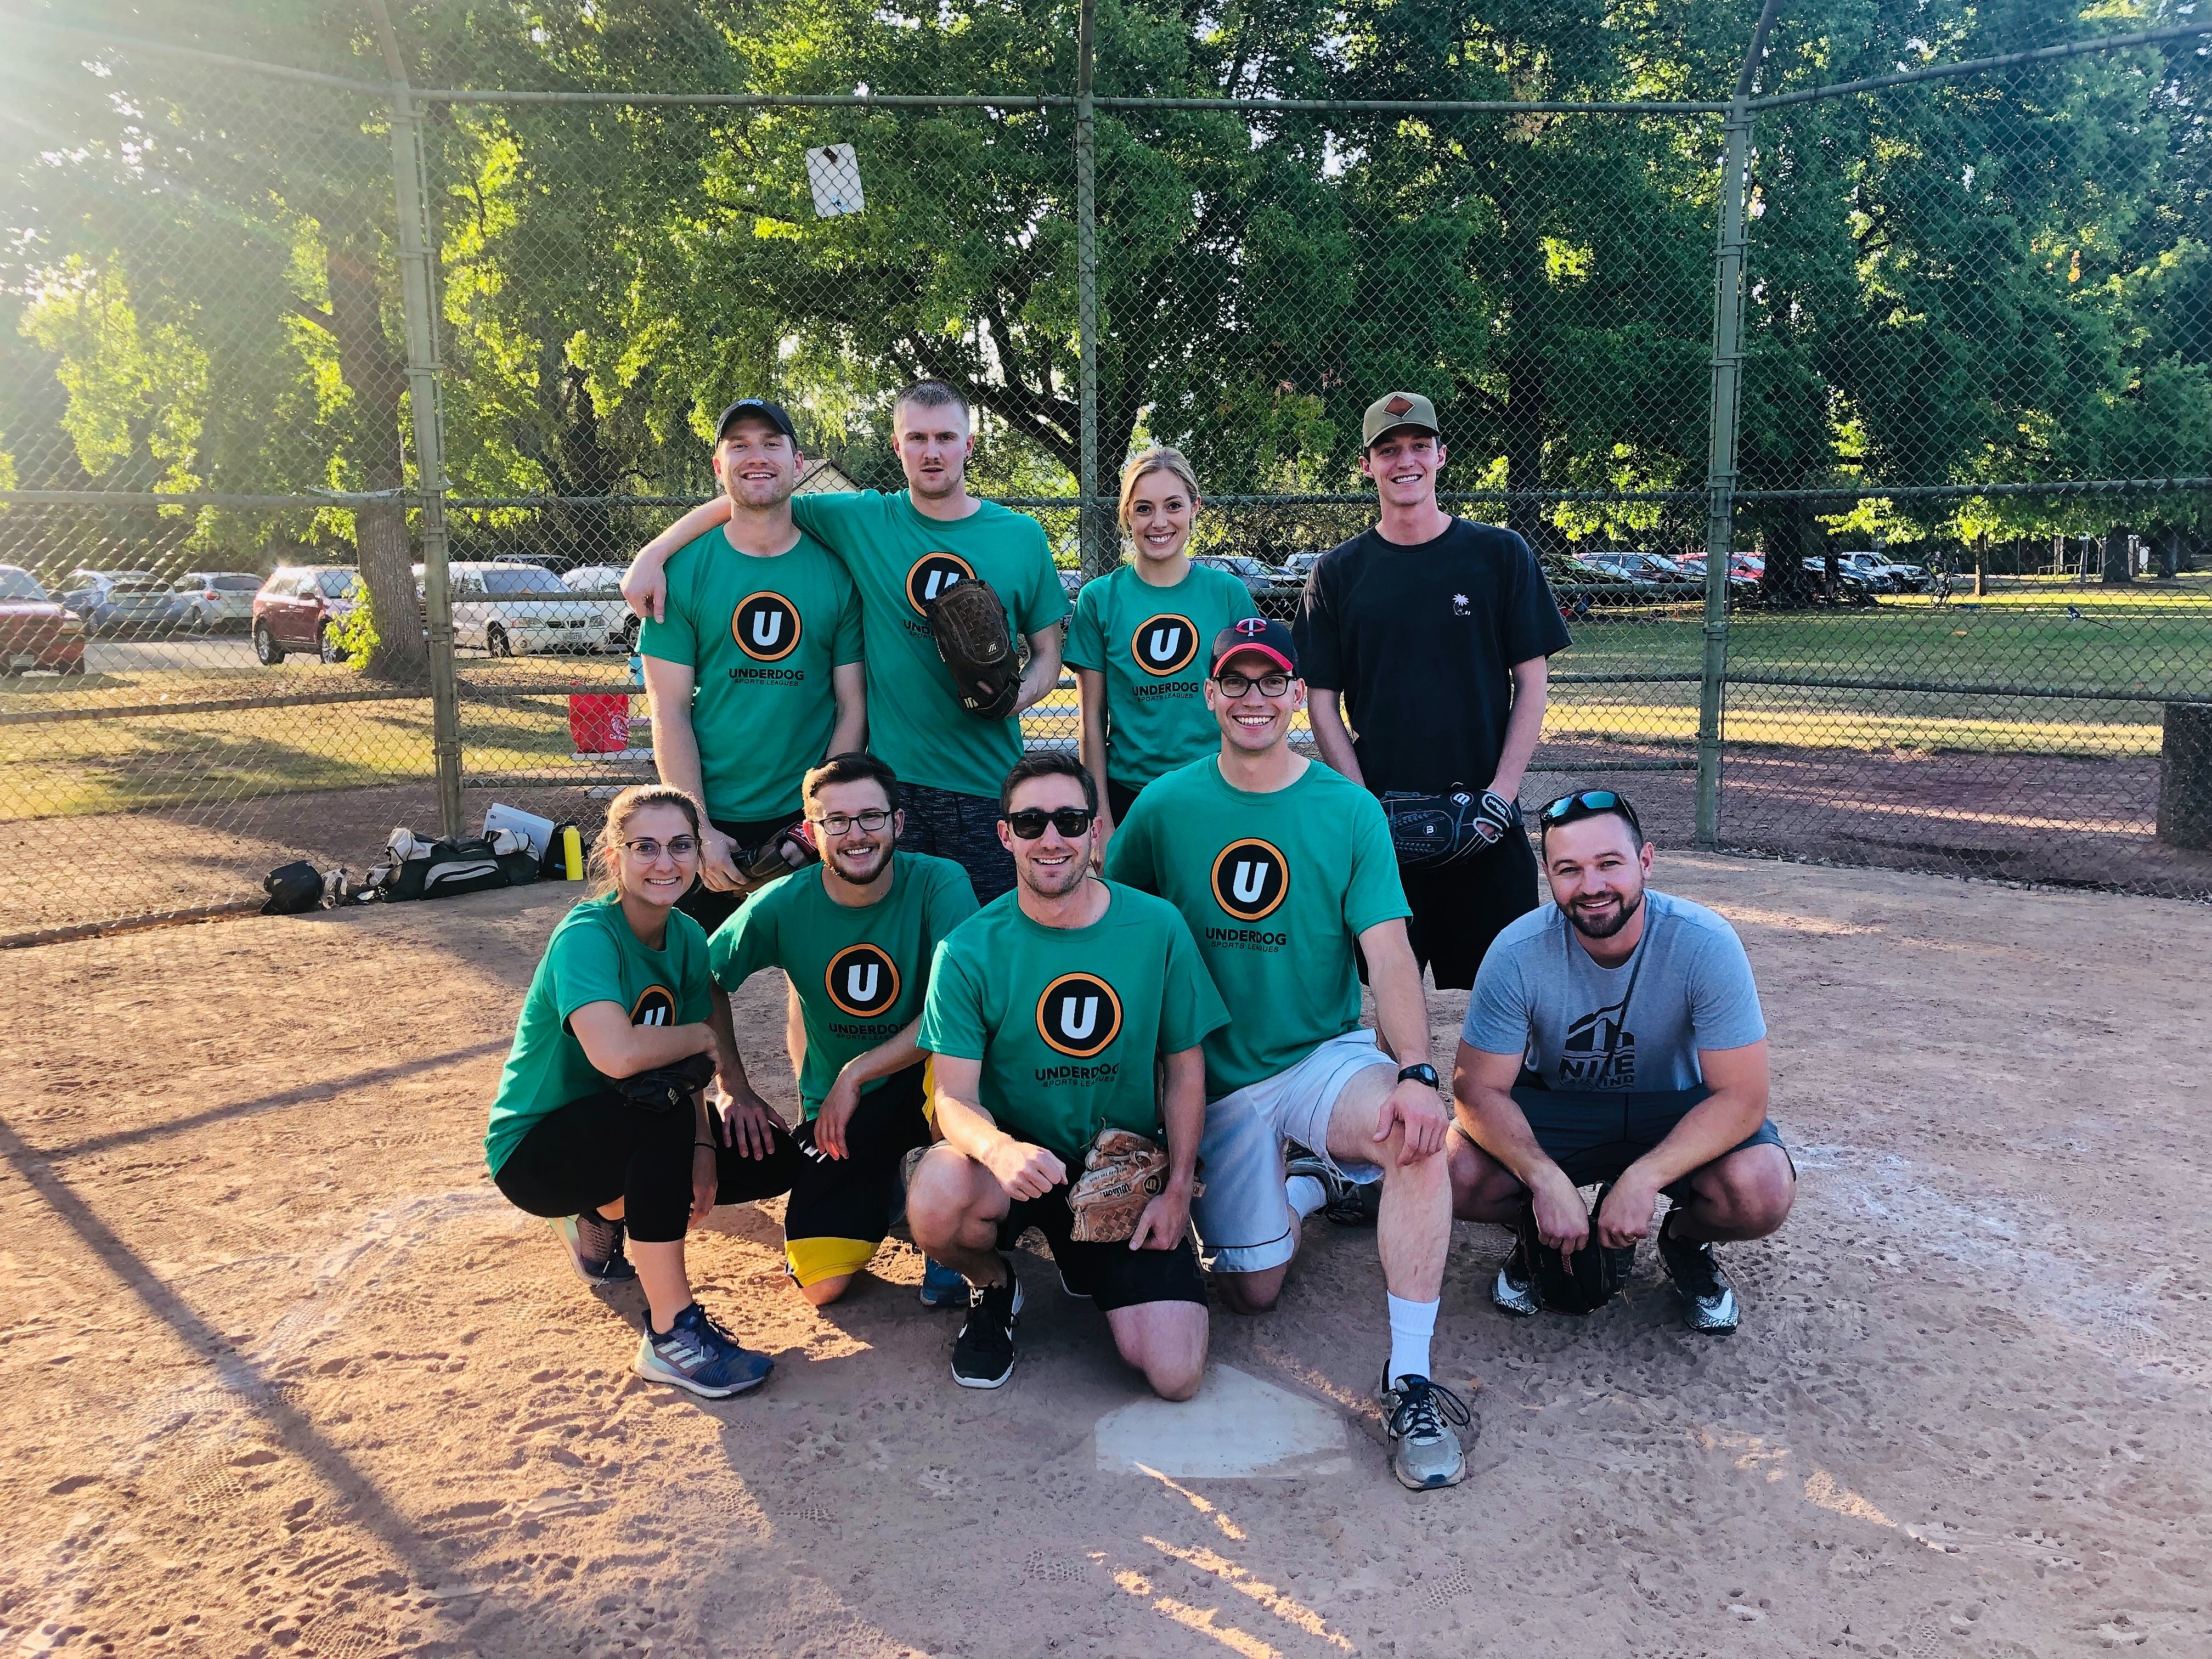 Portland Adult Softball Leagues, Co-ed Slow Pitch Softball